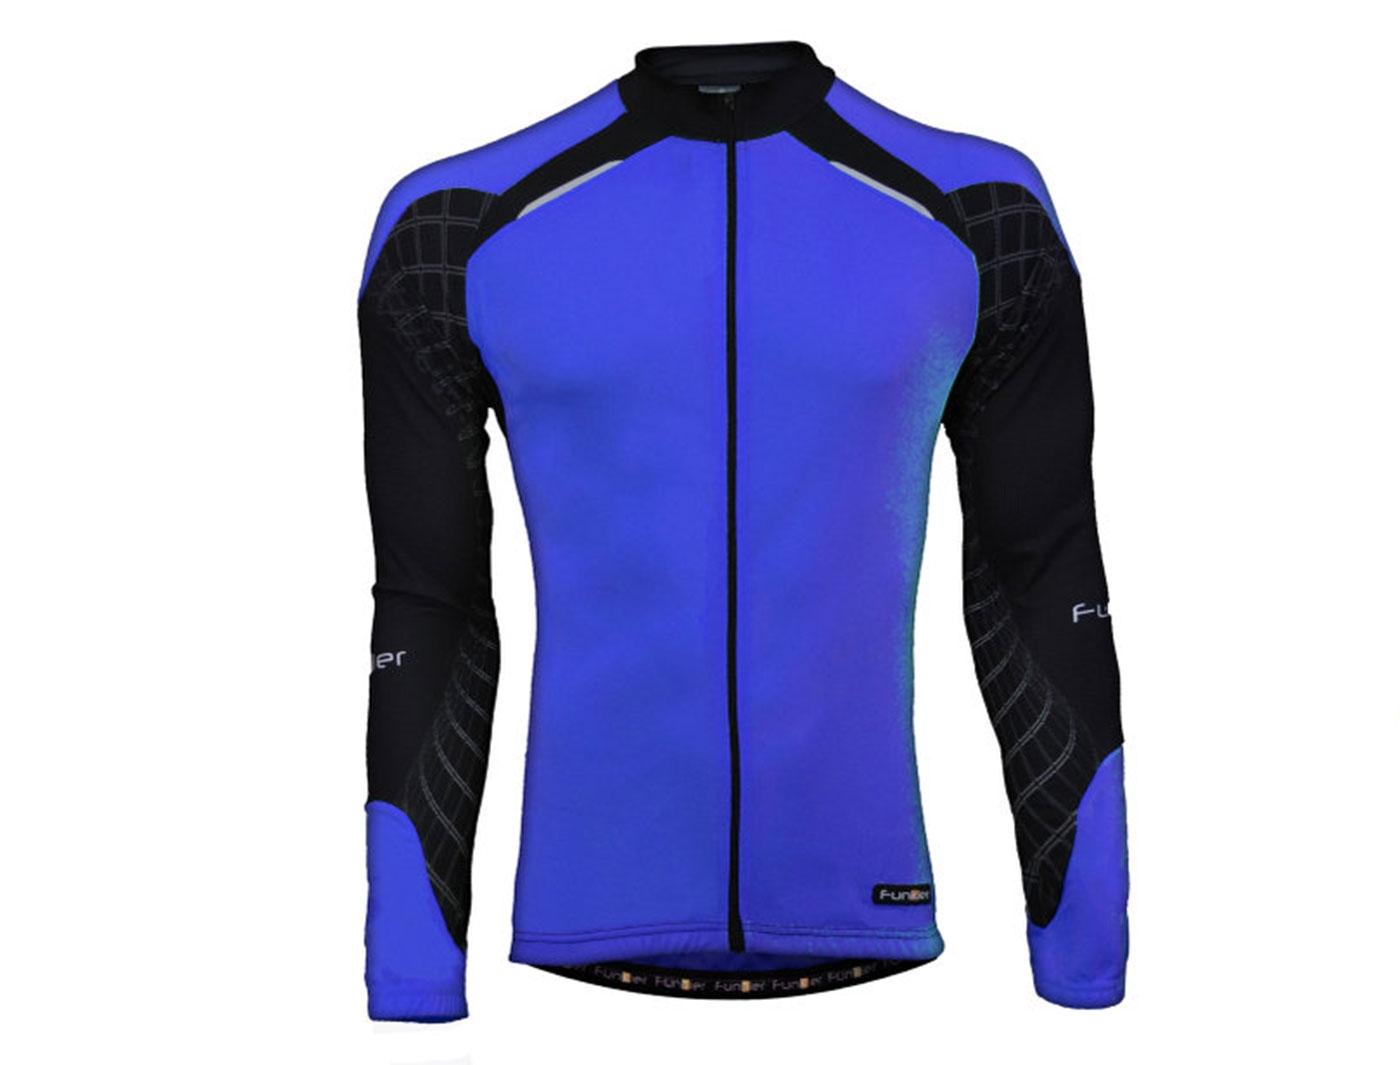 Велофутболка FunkierBike с длин. рукавом J-611-LW-Blue (Cине-черная) с молнией